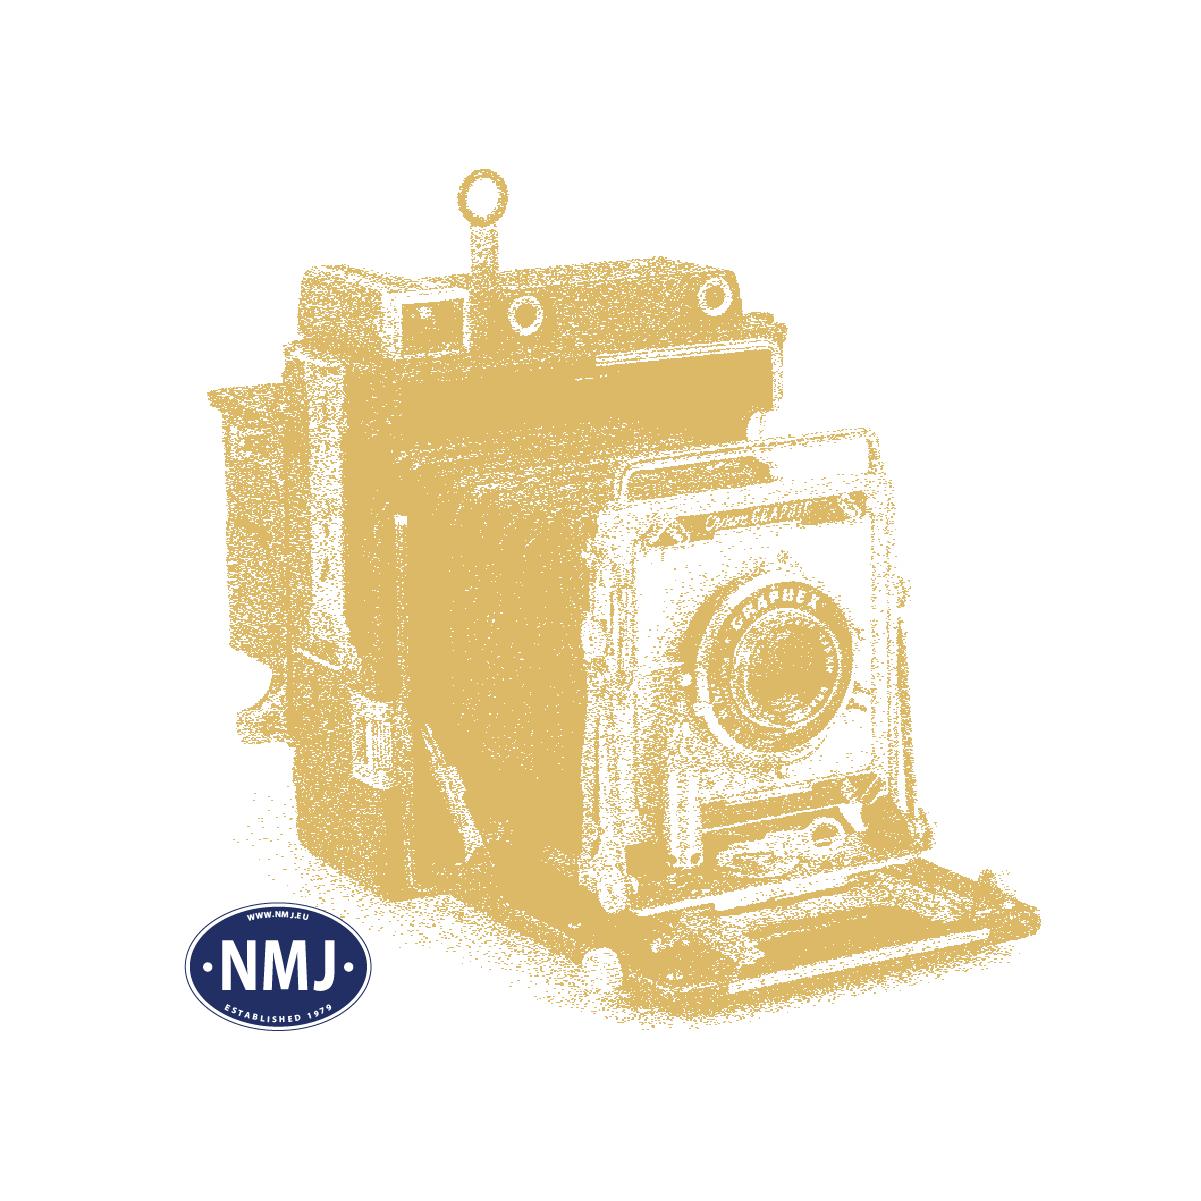 NMJ0T3-3 - NMJ Superline NSB T3 10962, 0-Scala